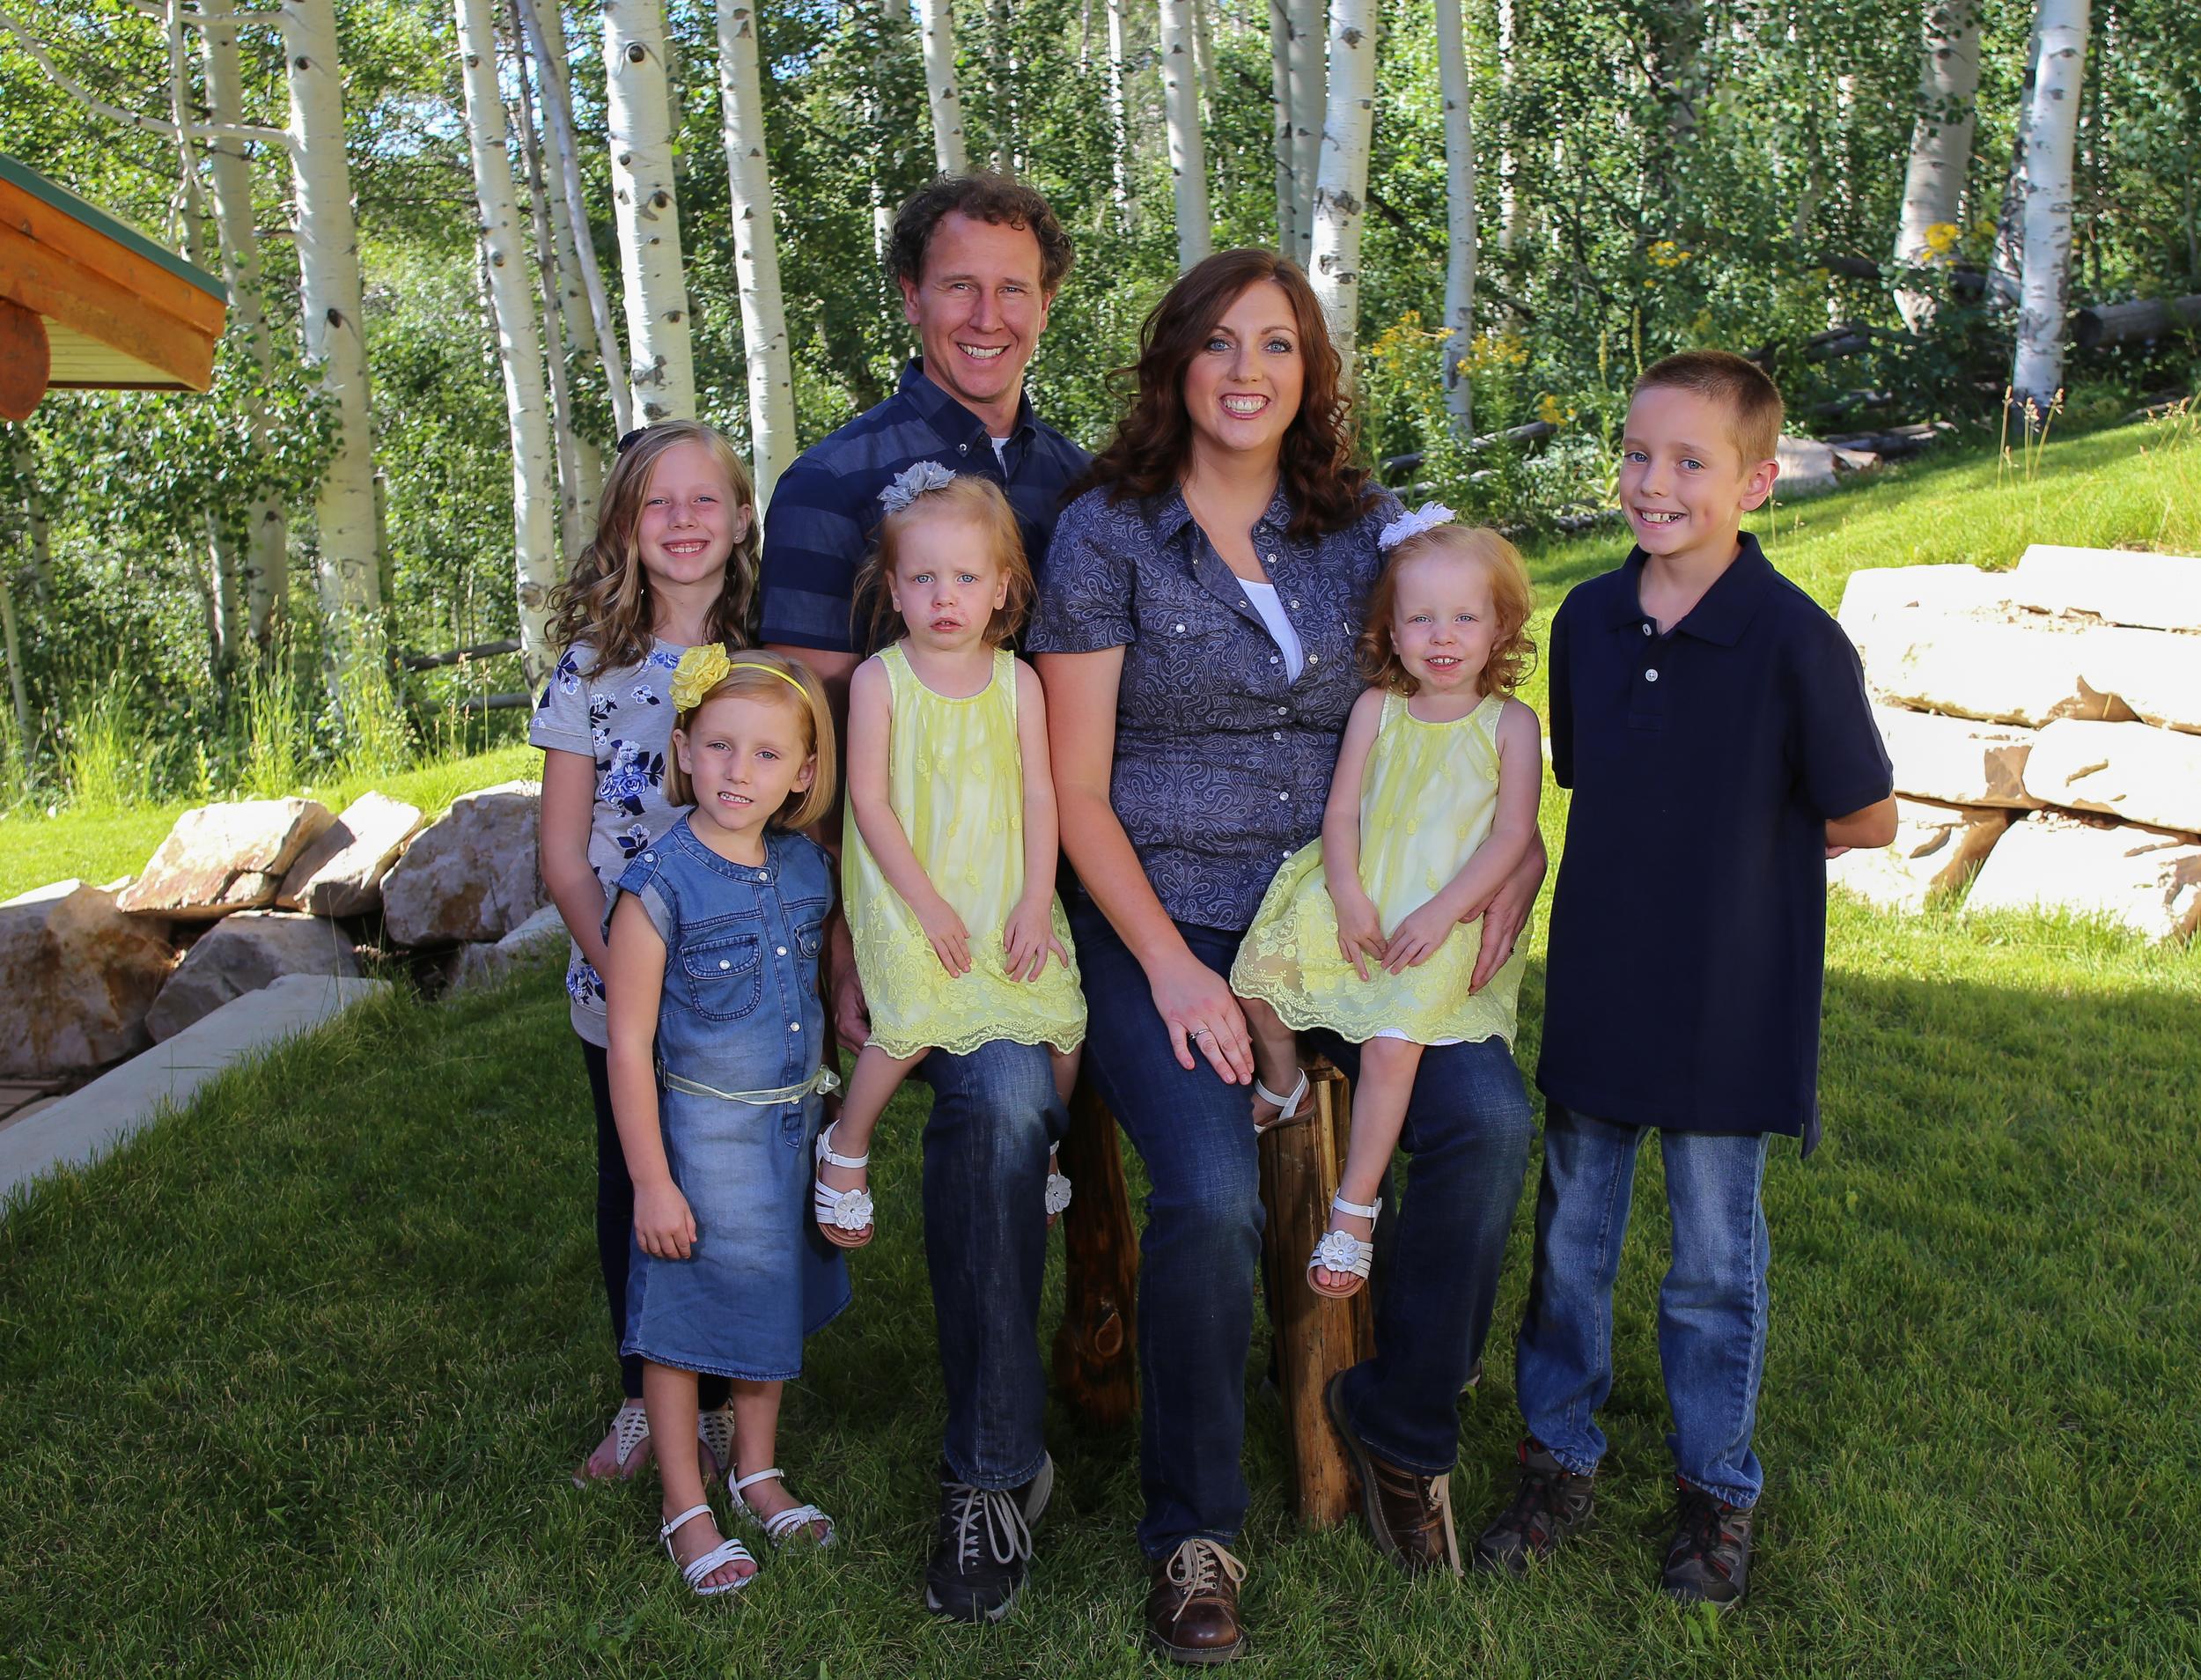 Bountiful portrait studio, Utah family photography